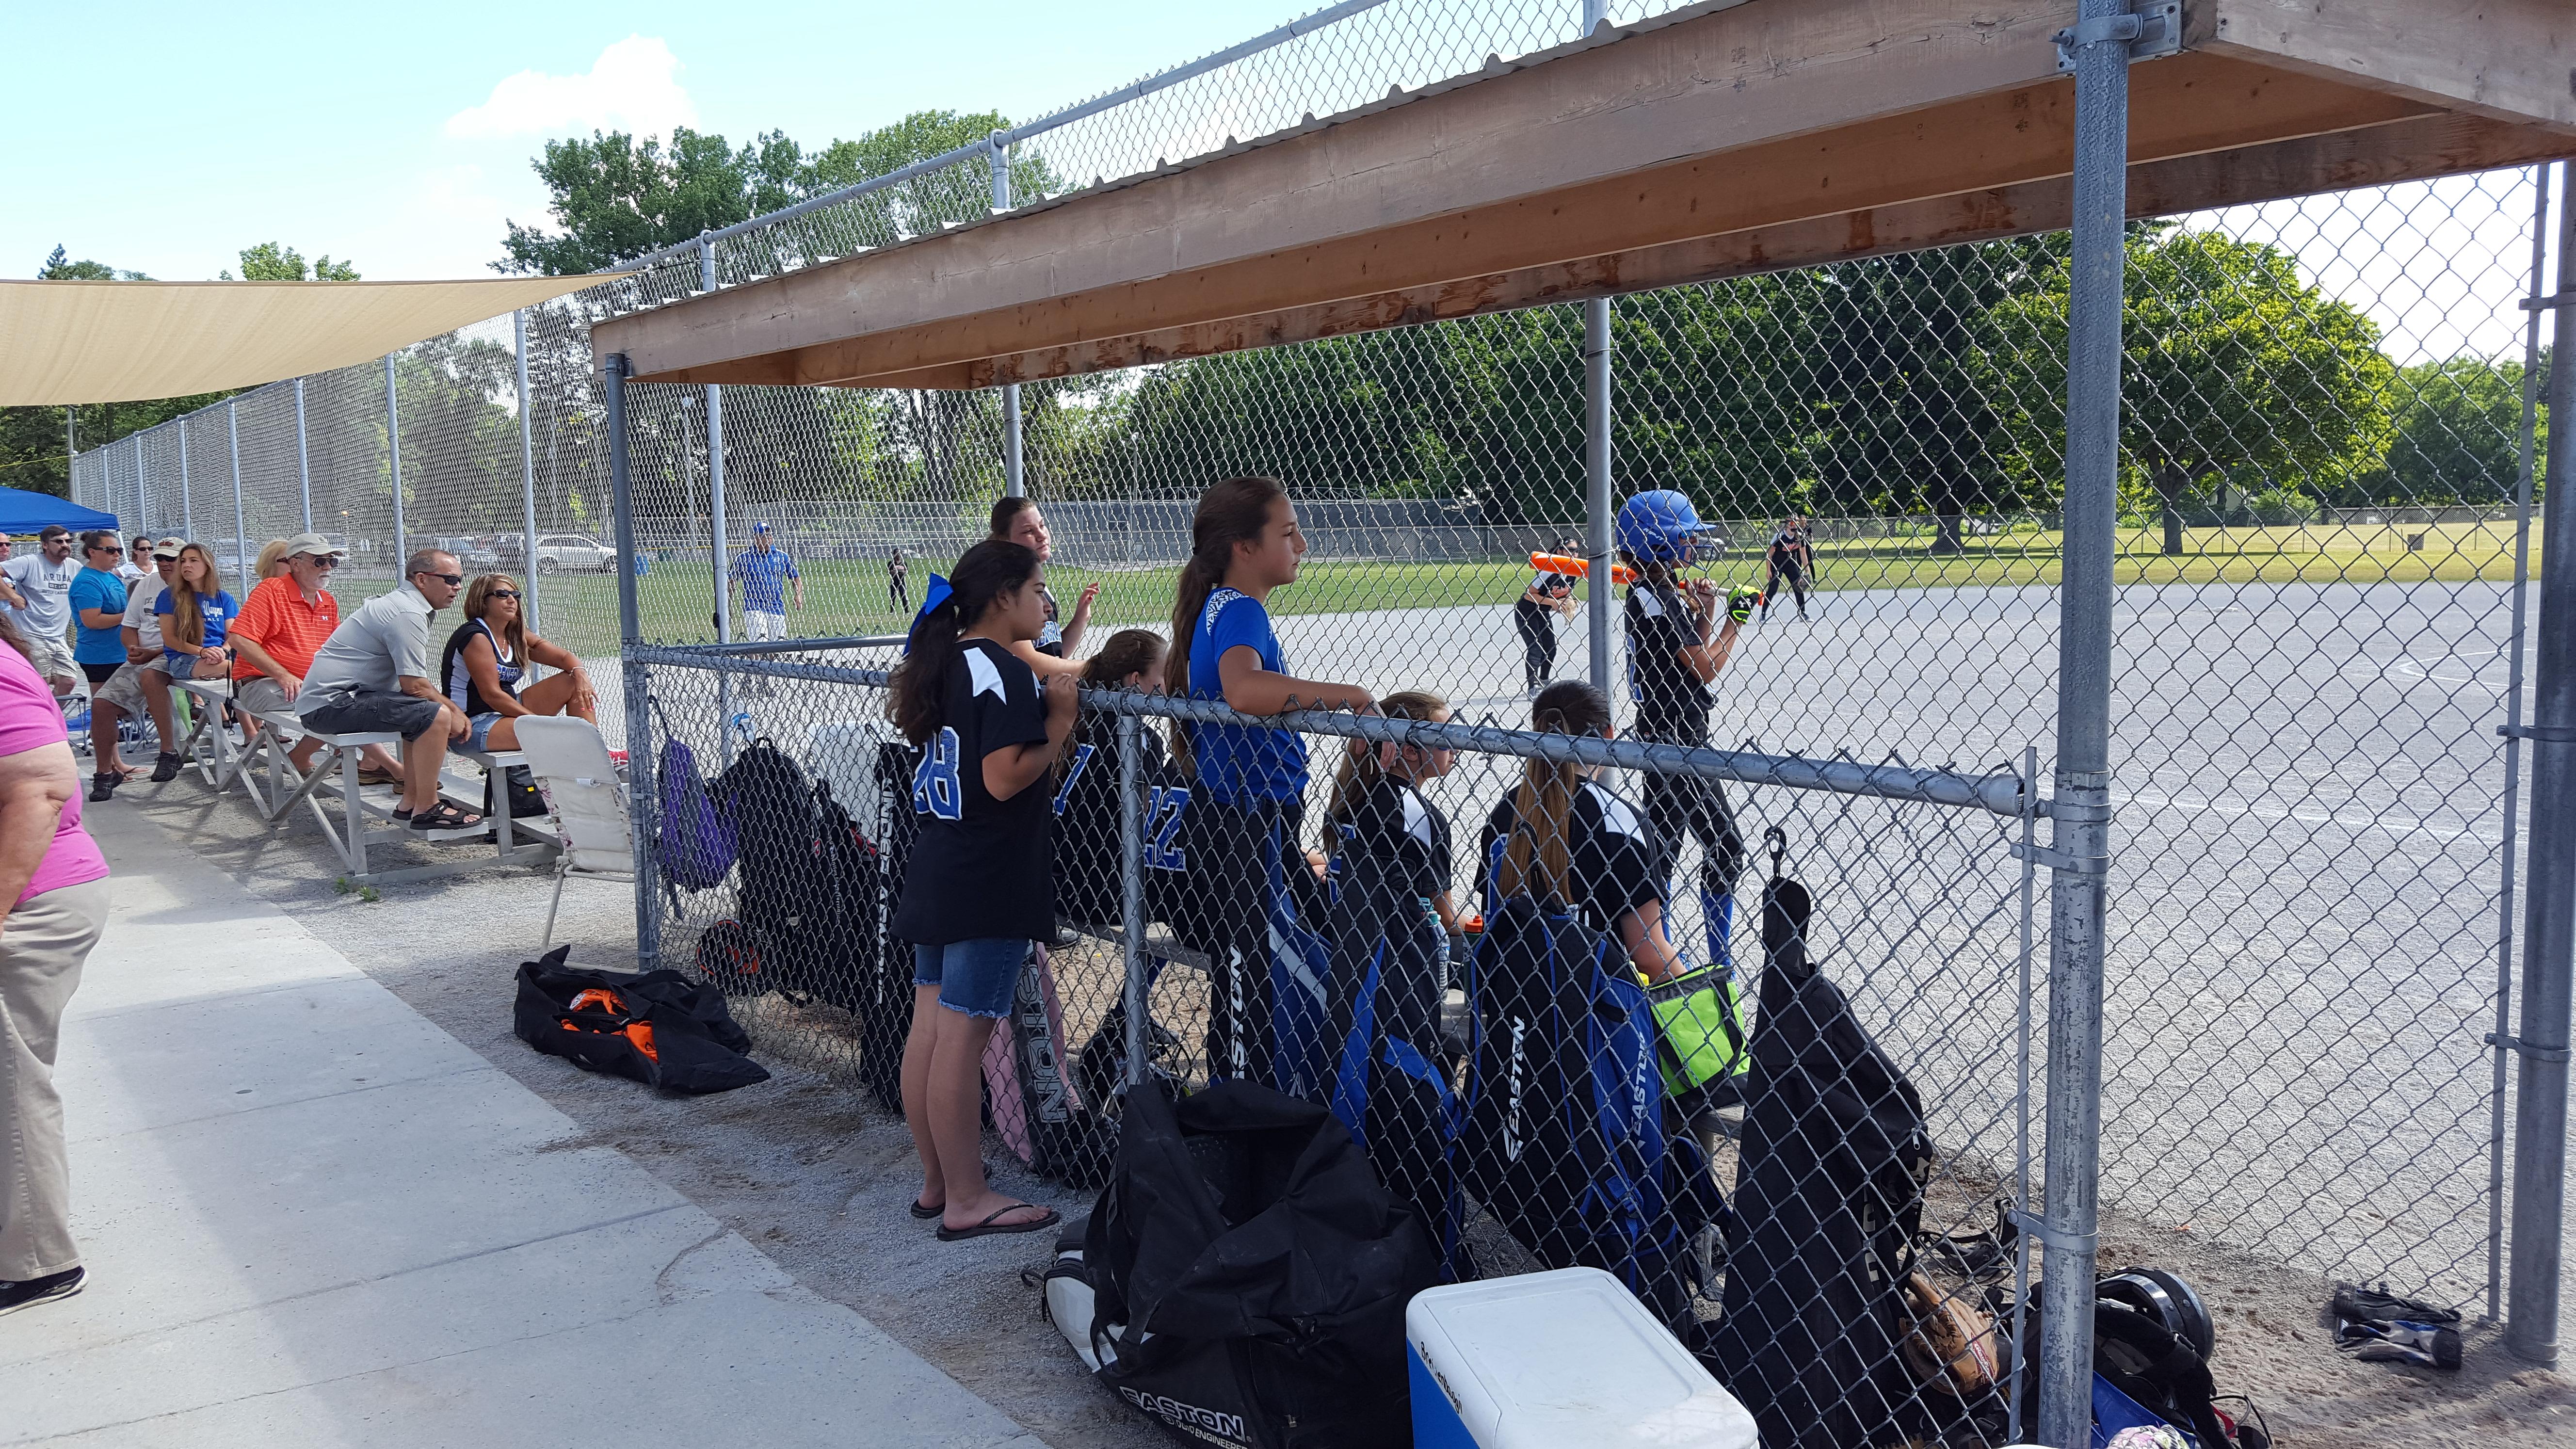 Softball Tournament in Swanton July, 2016 (17)